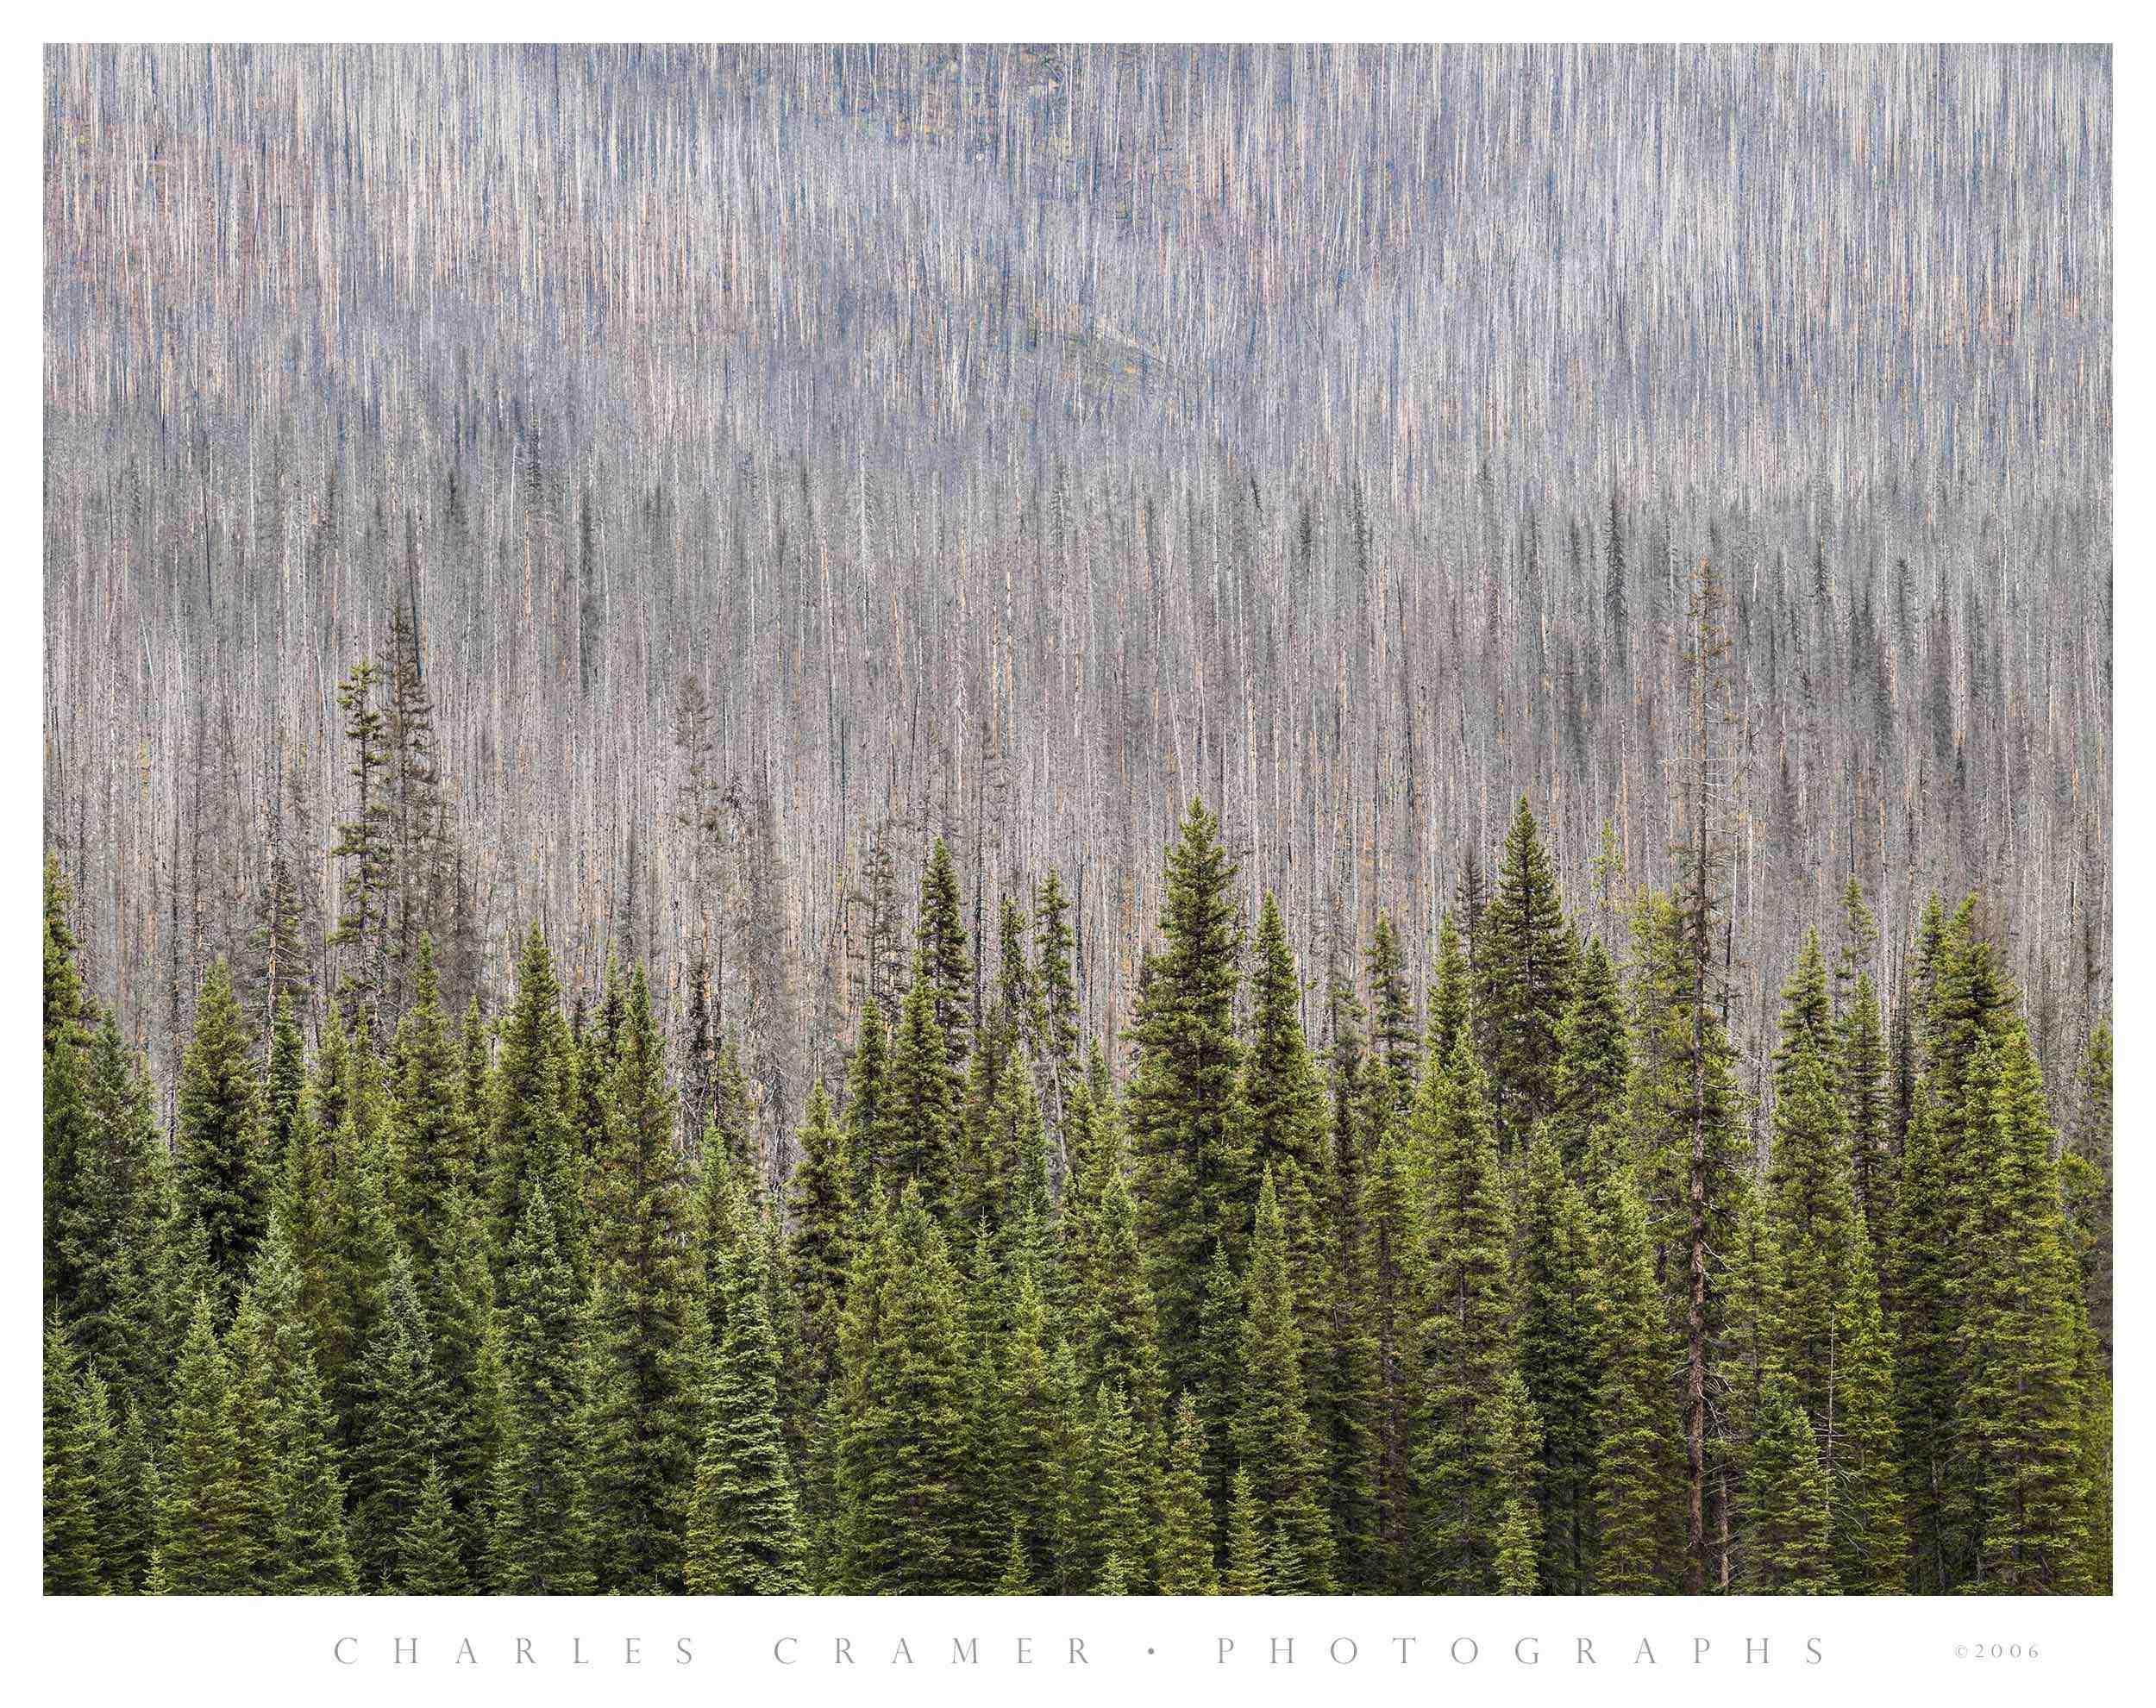 New Growth, Burned Hillside, Kootenay, Canada